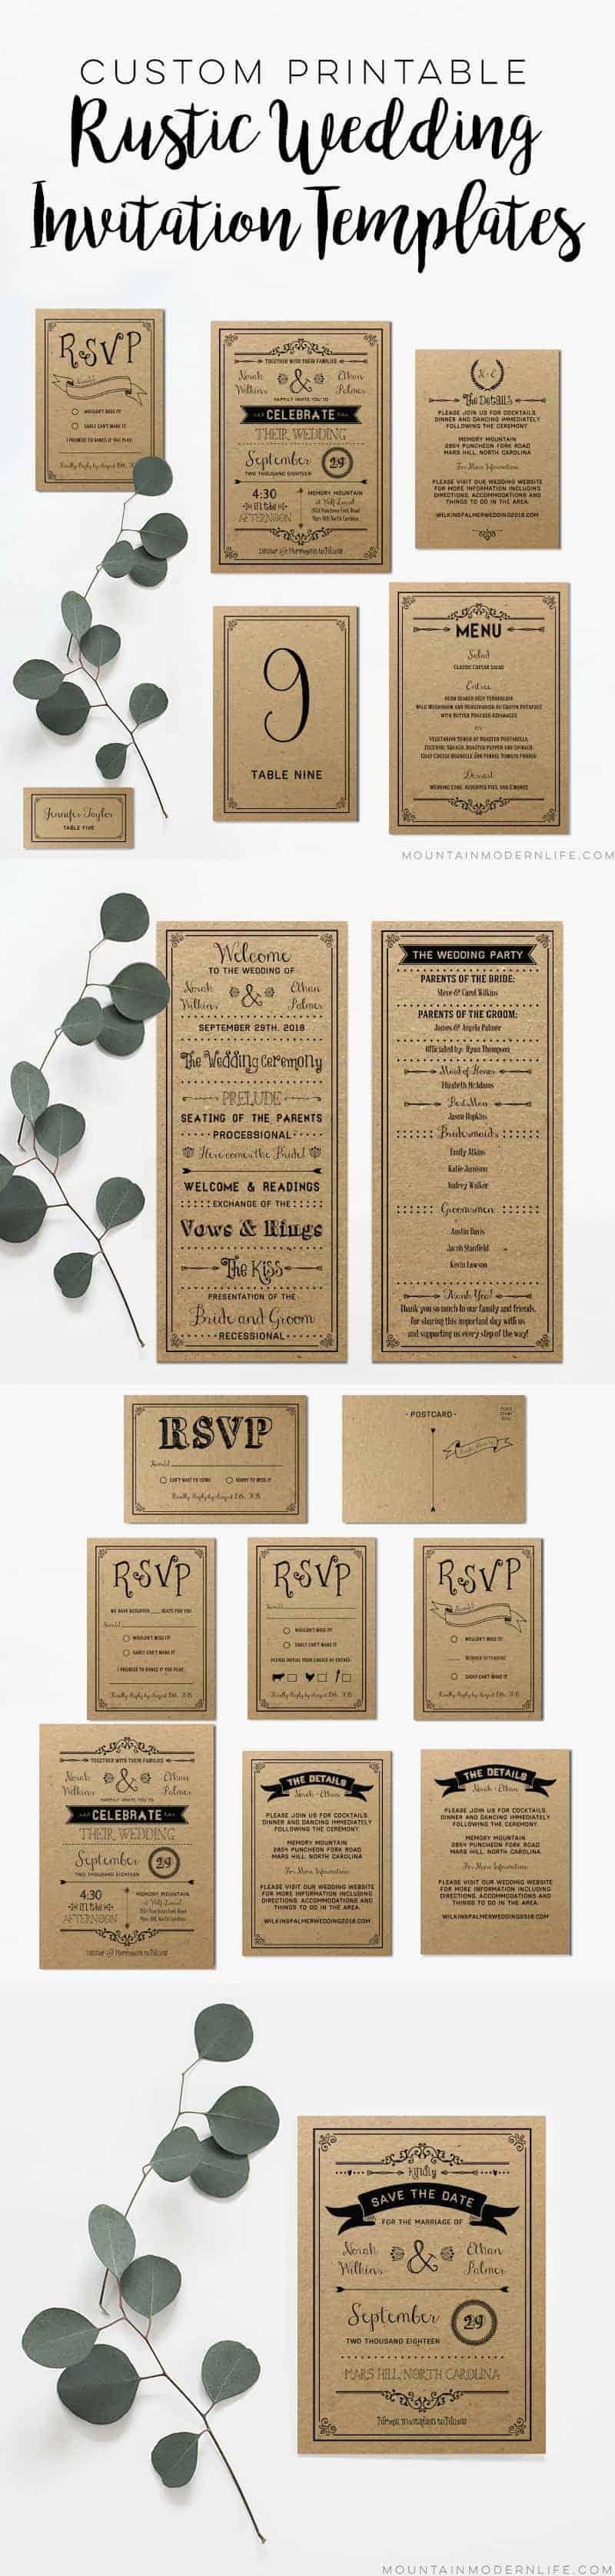 Custom Printable Wedding Invitation Templates | MountainModernLife.com